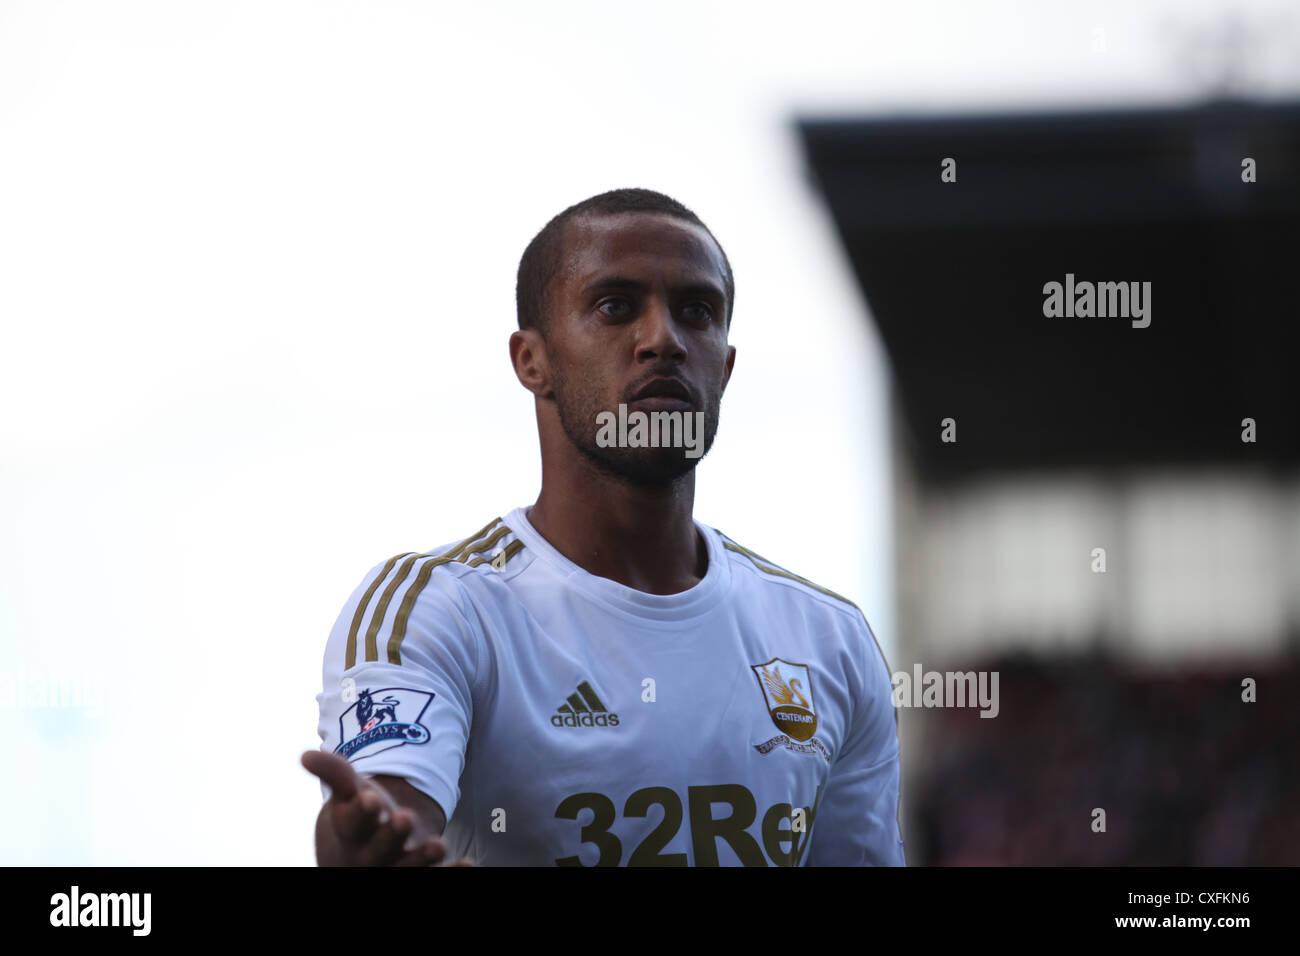 Wayne Routledge, Barclays Premier League, Stoke City (red) V Swansea, Britannia Stadium, 29/09/12 - Stock Image